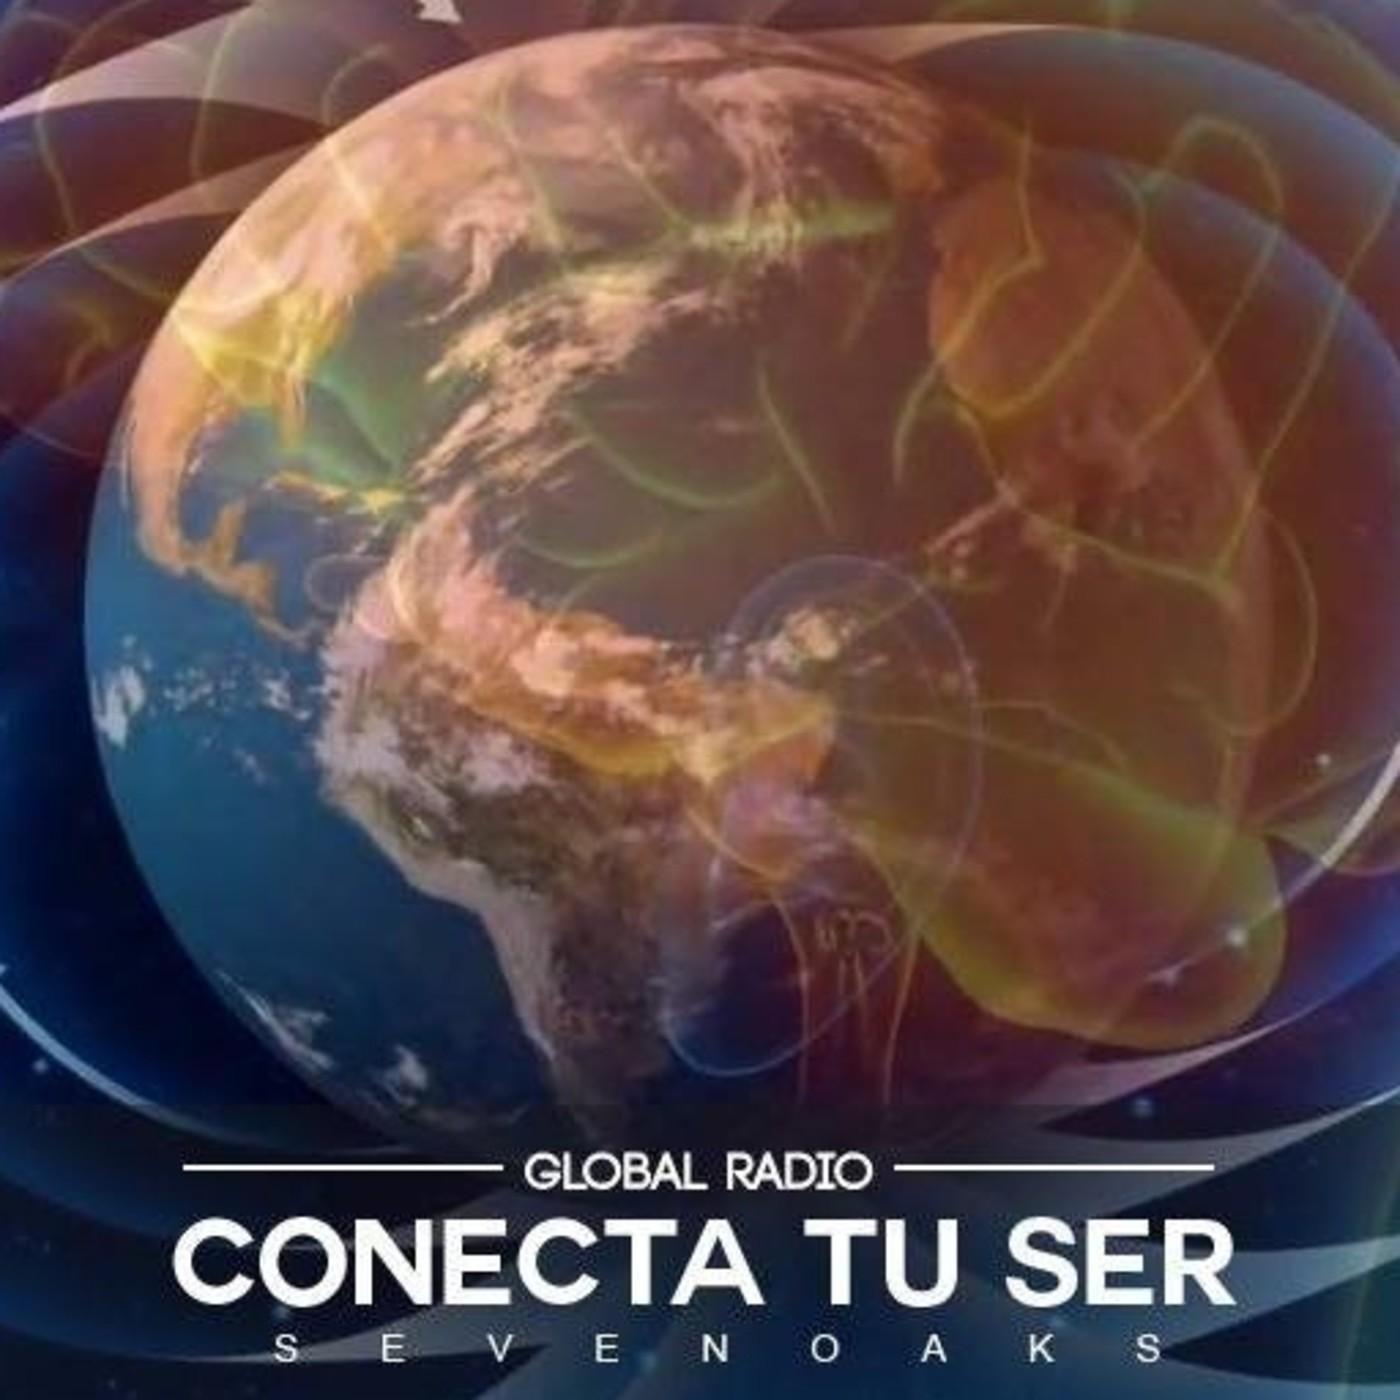 Global Radio CTS Sevenoaks